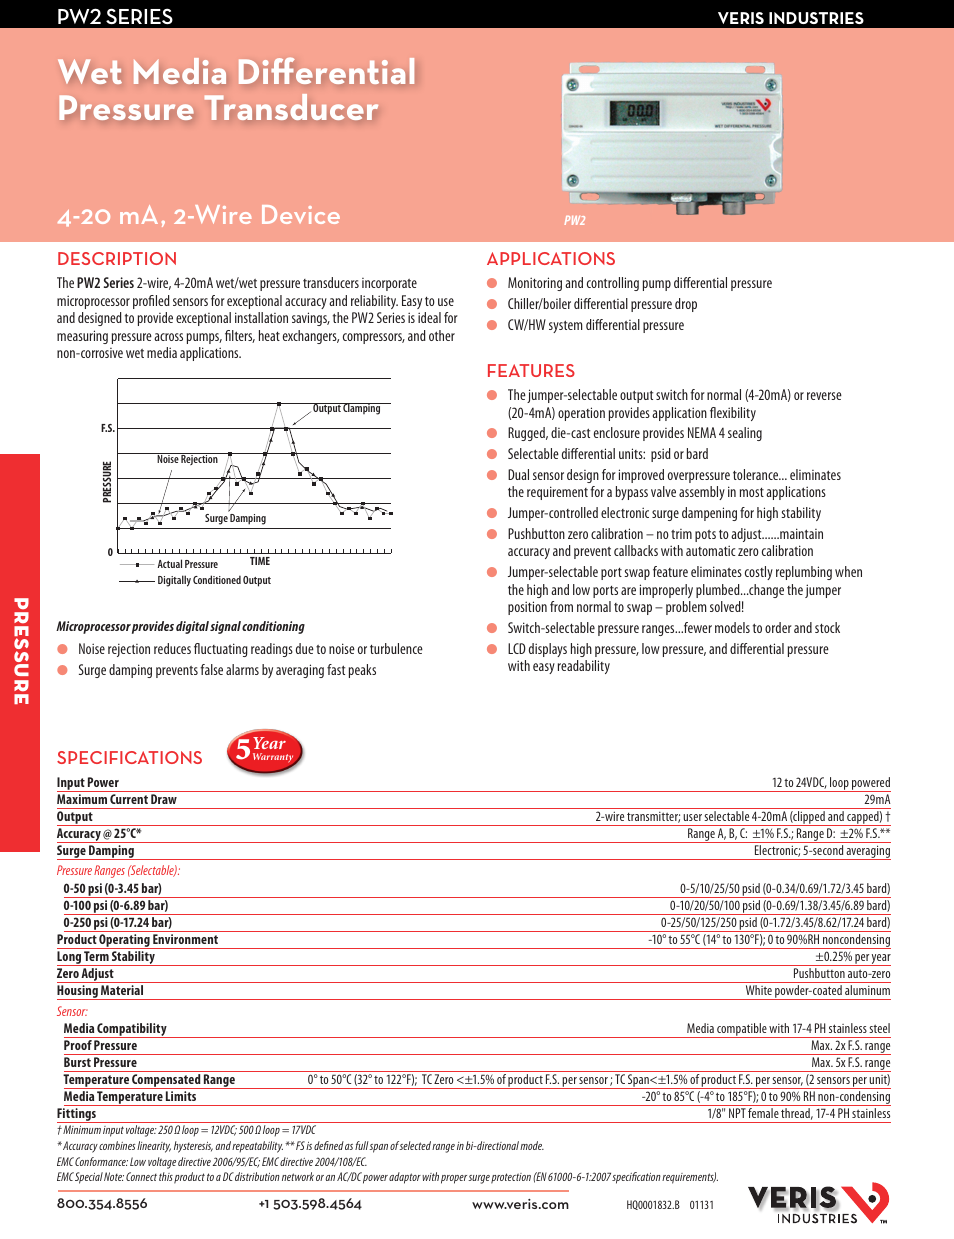 Veris Industries PW2 SERIES Datasheet User Manual | 2 pages